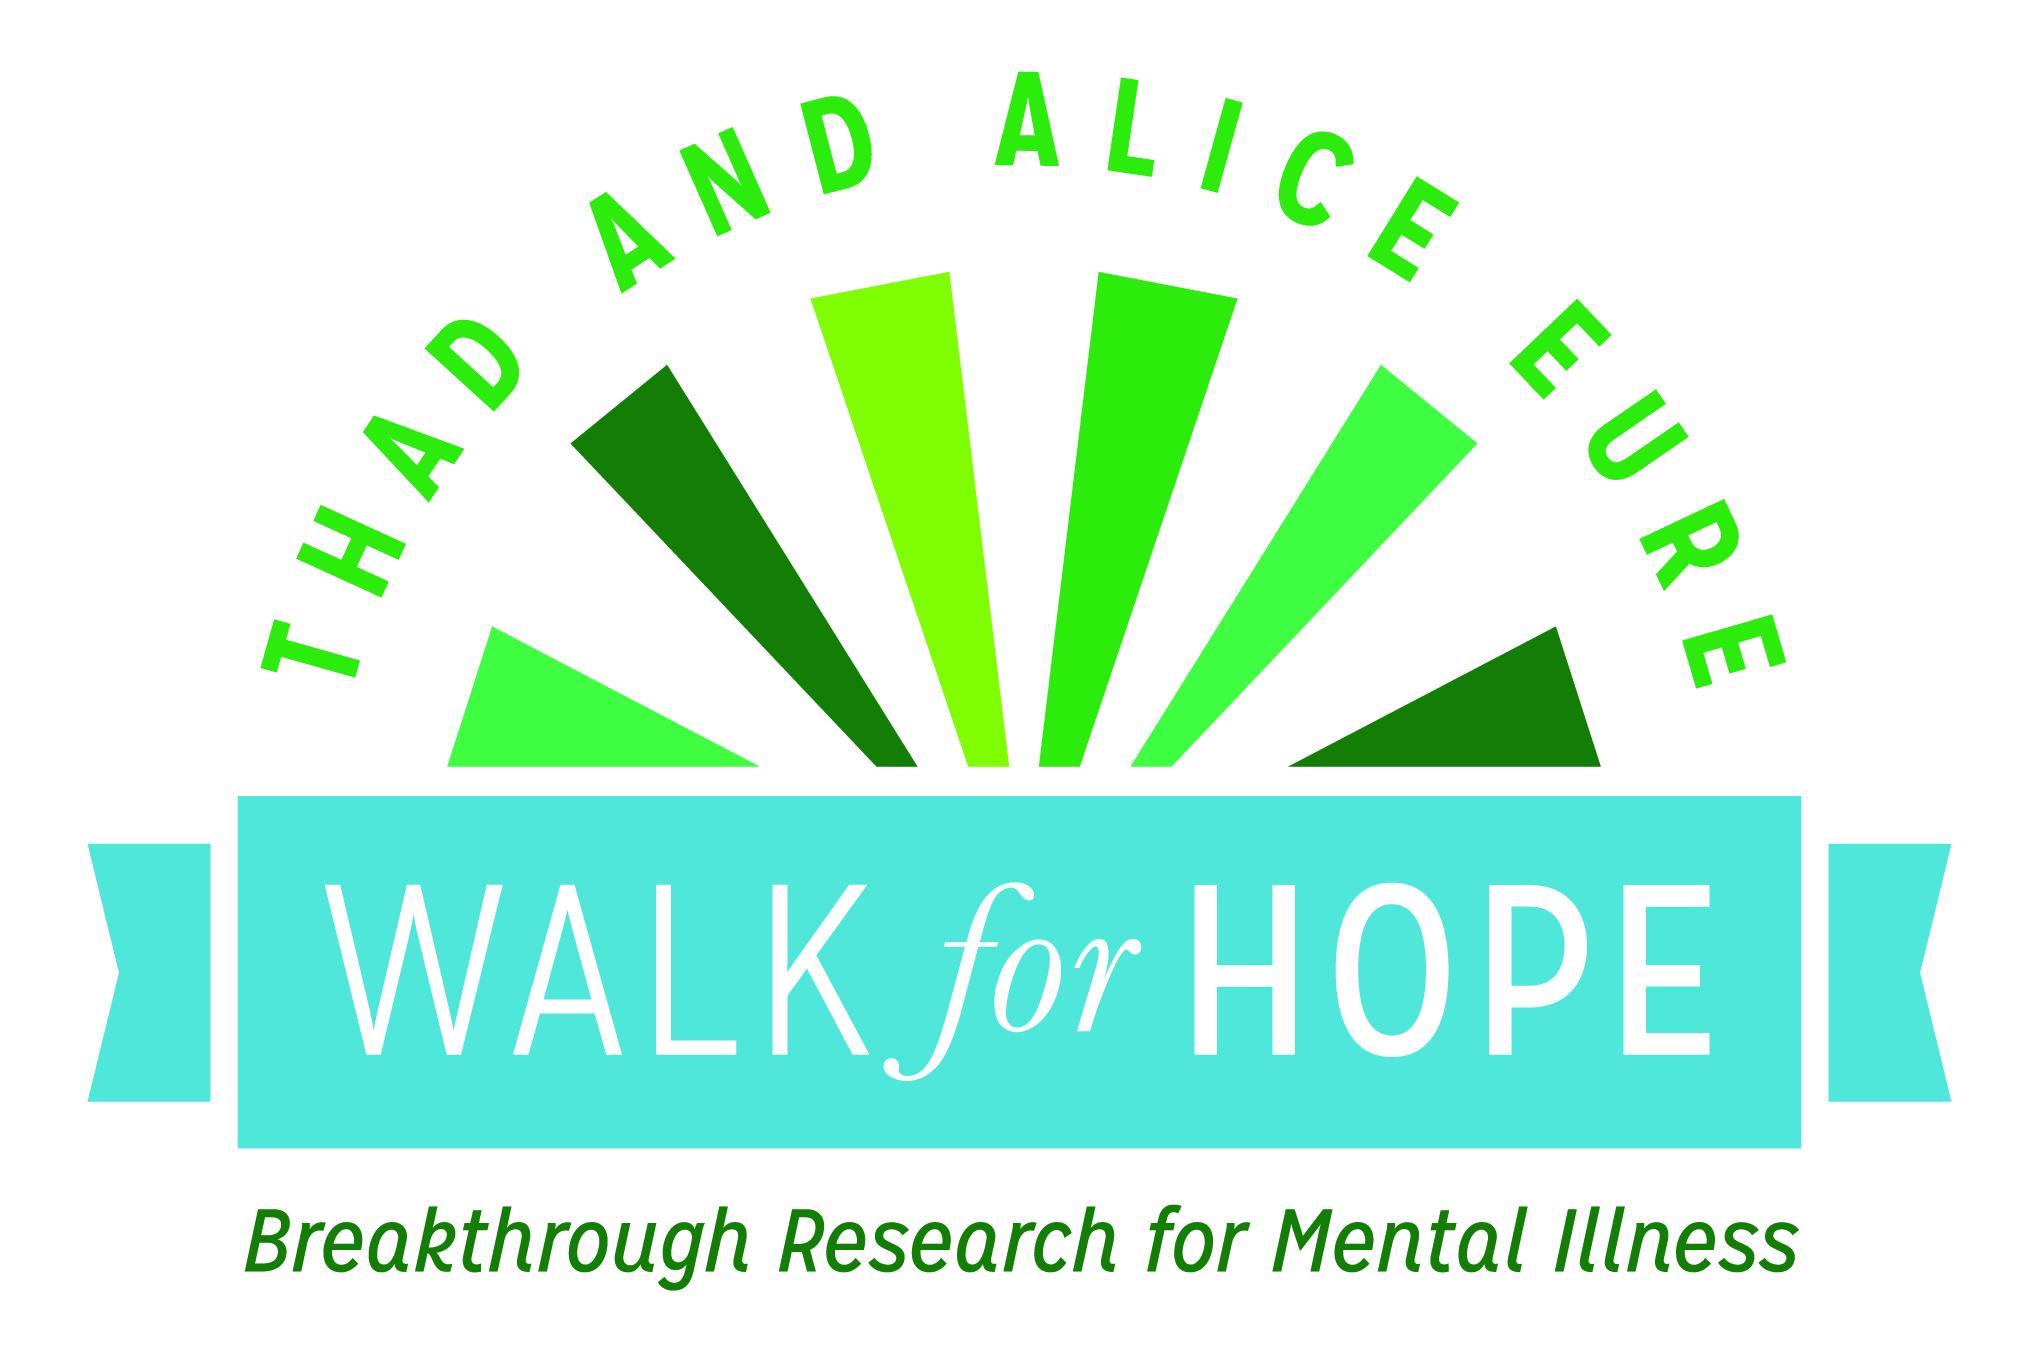 31st Annual Thad & Alice Eure Walk/Run for Hope